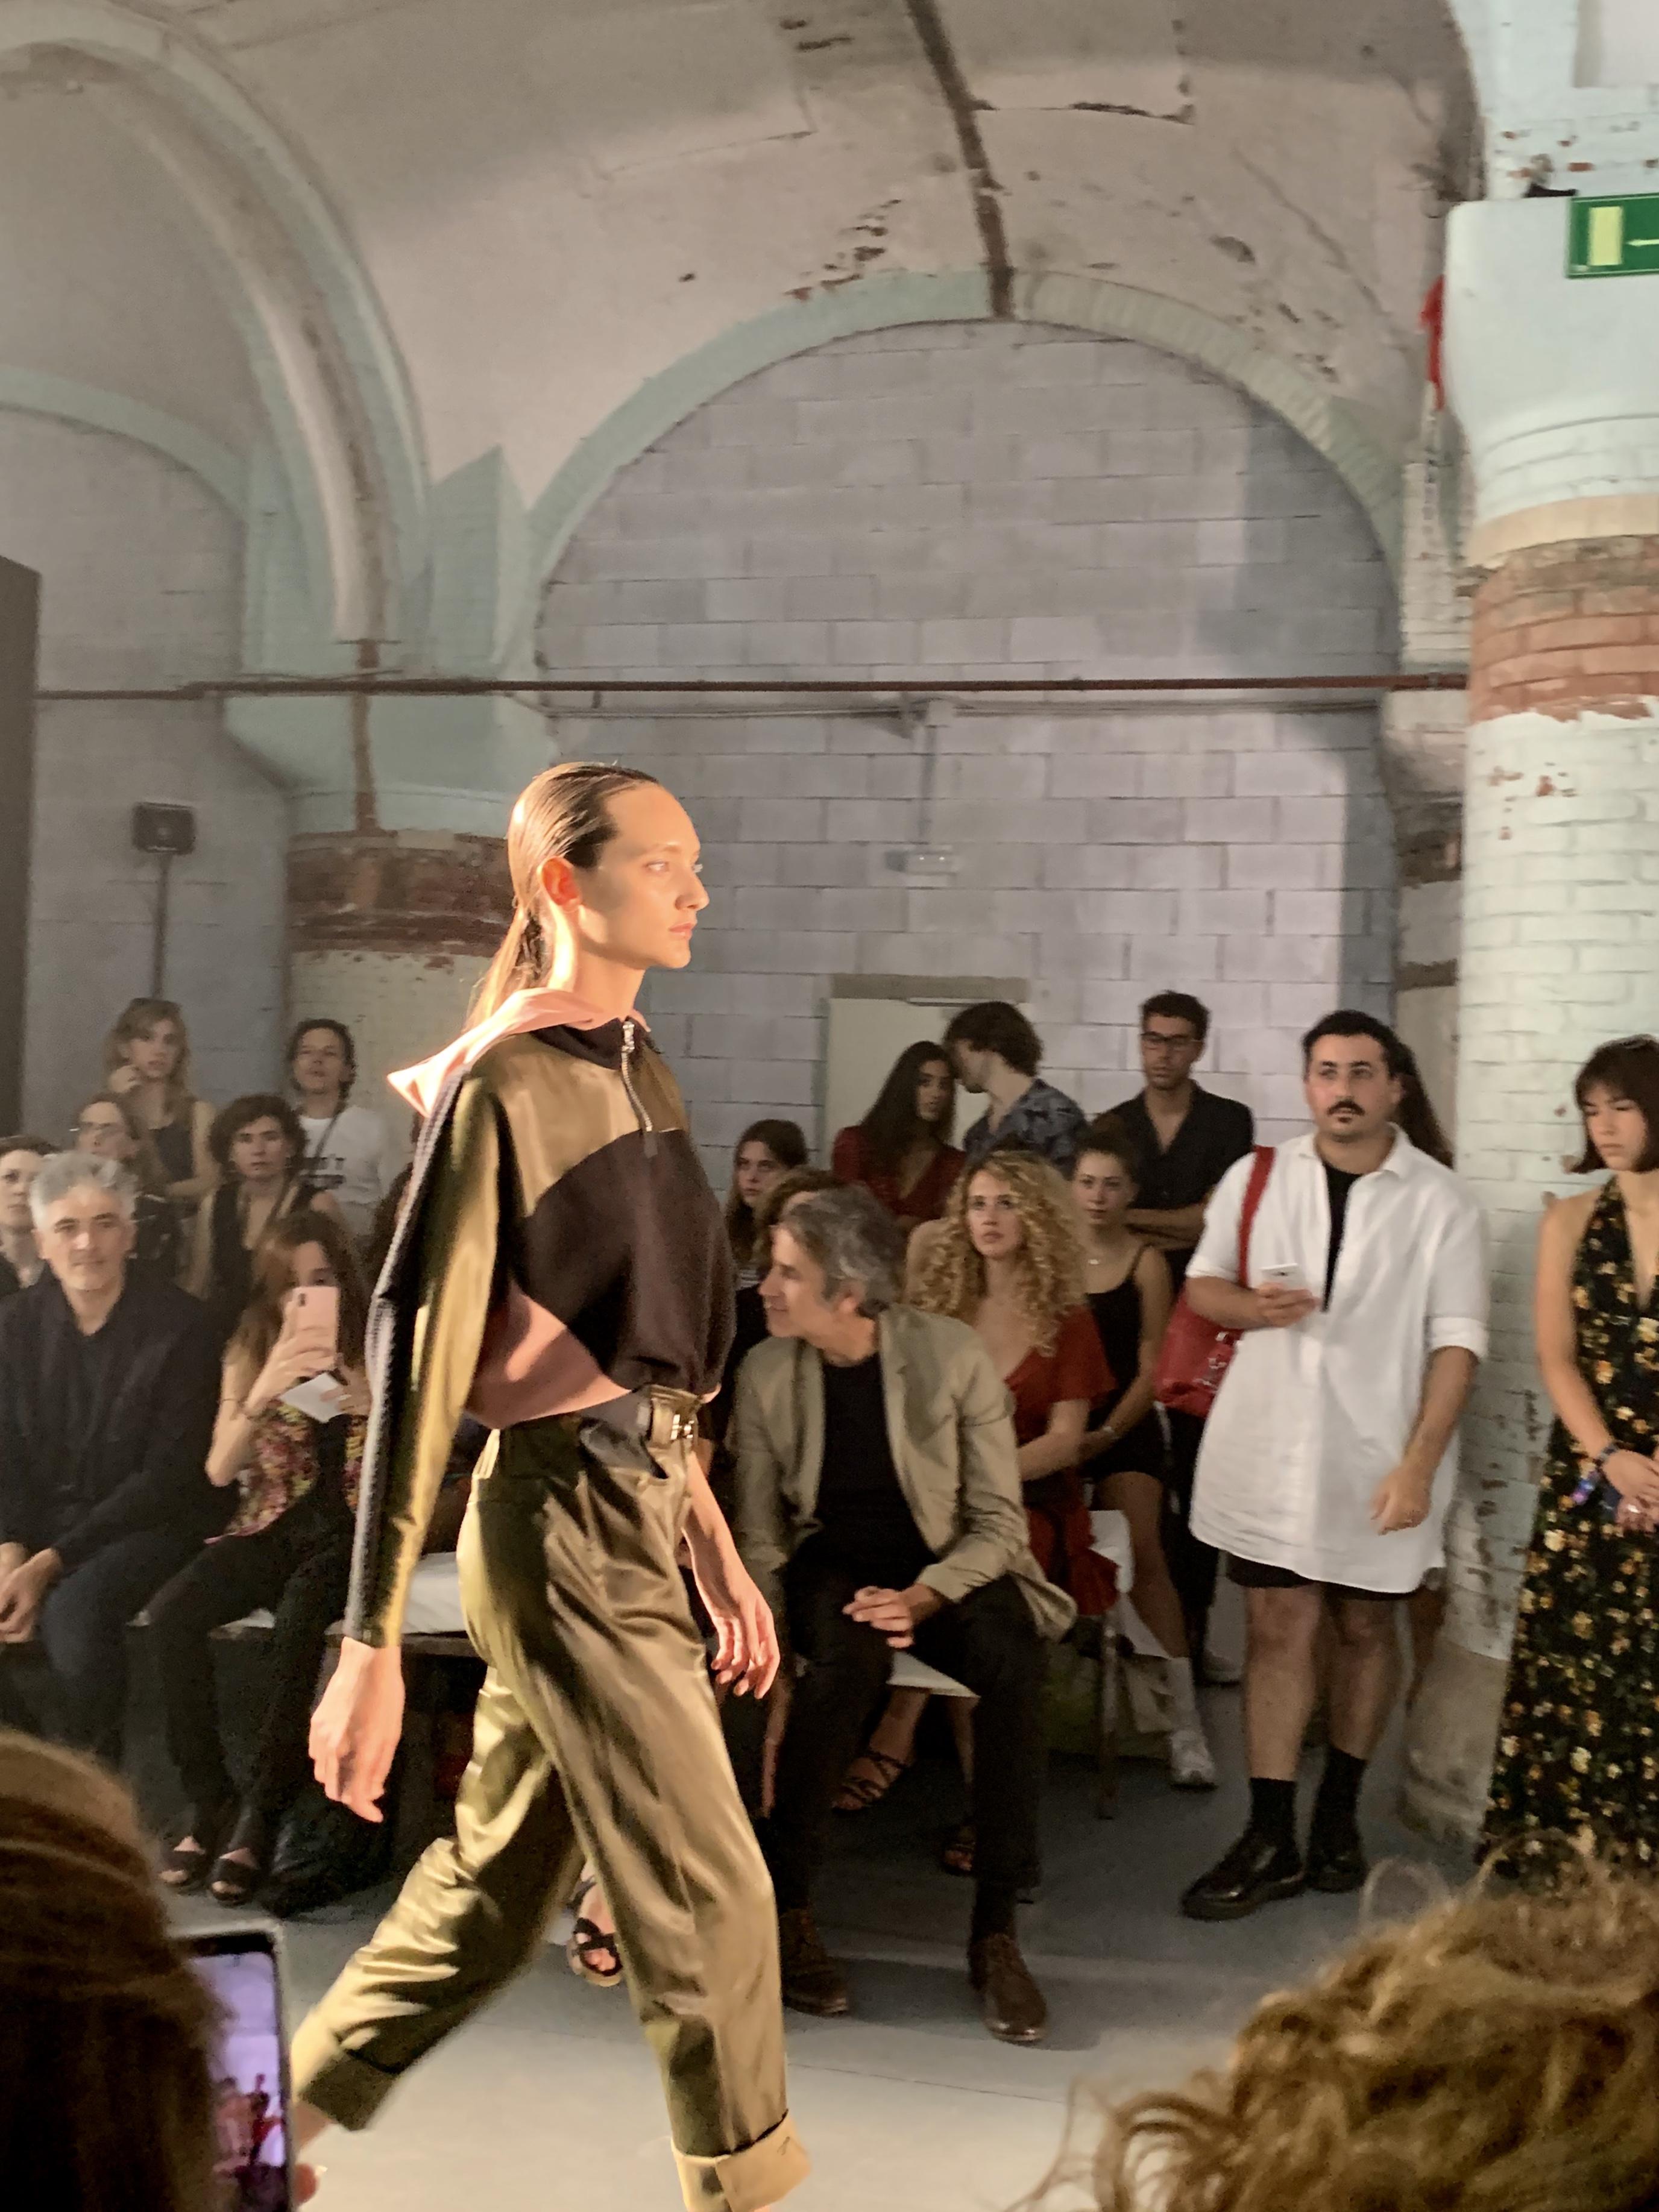 Whynot-shopper-080-bcn-fashion-tendencias-txell-miras-2020